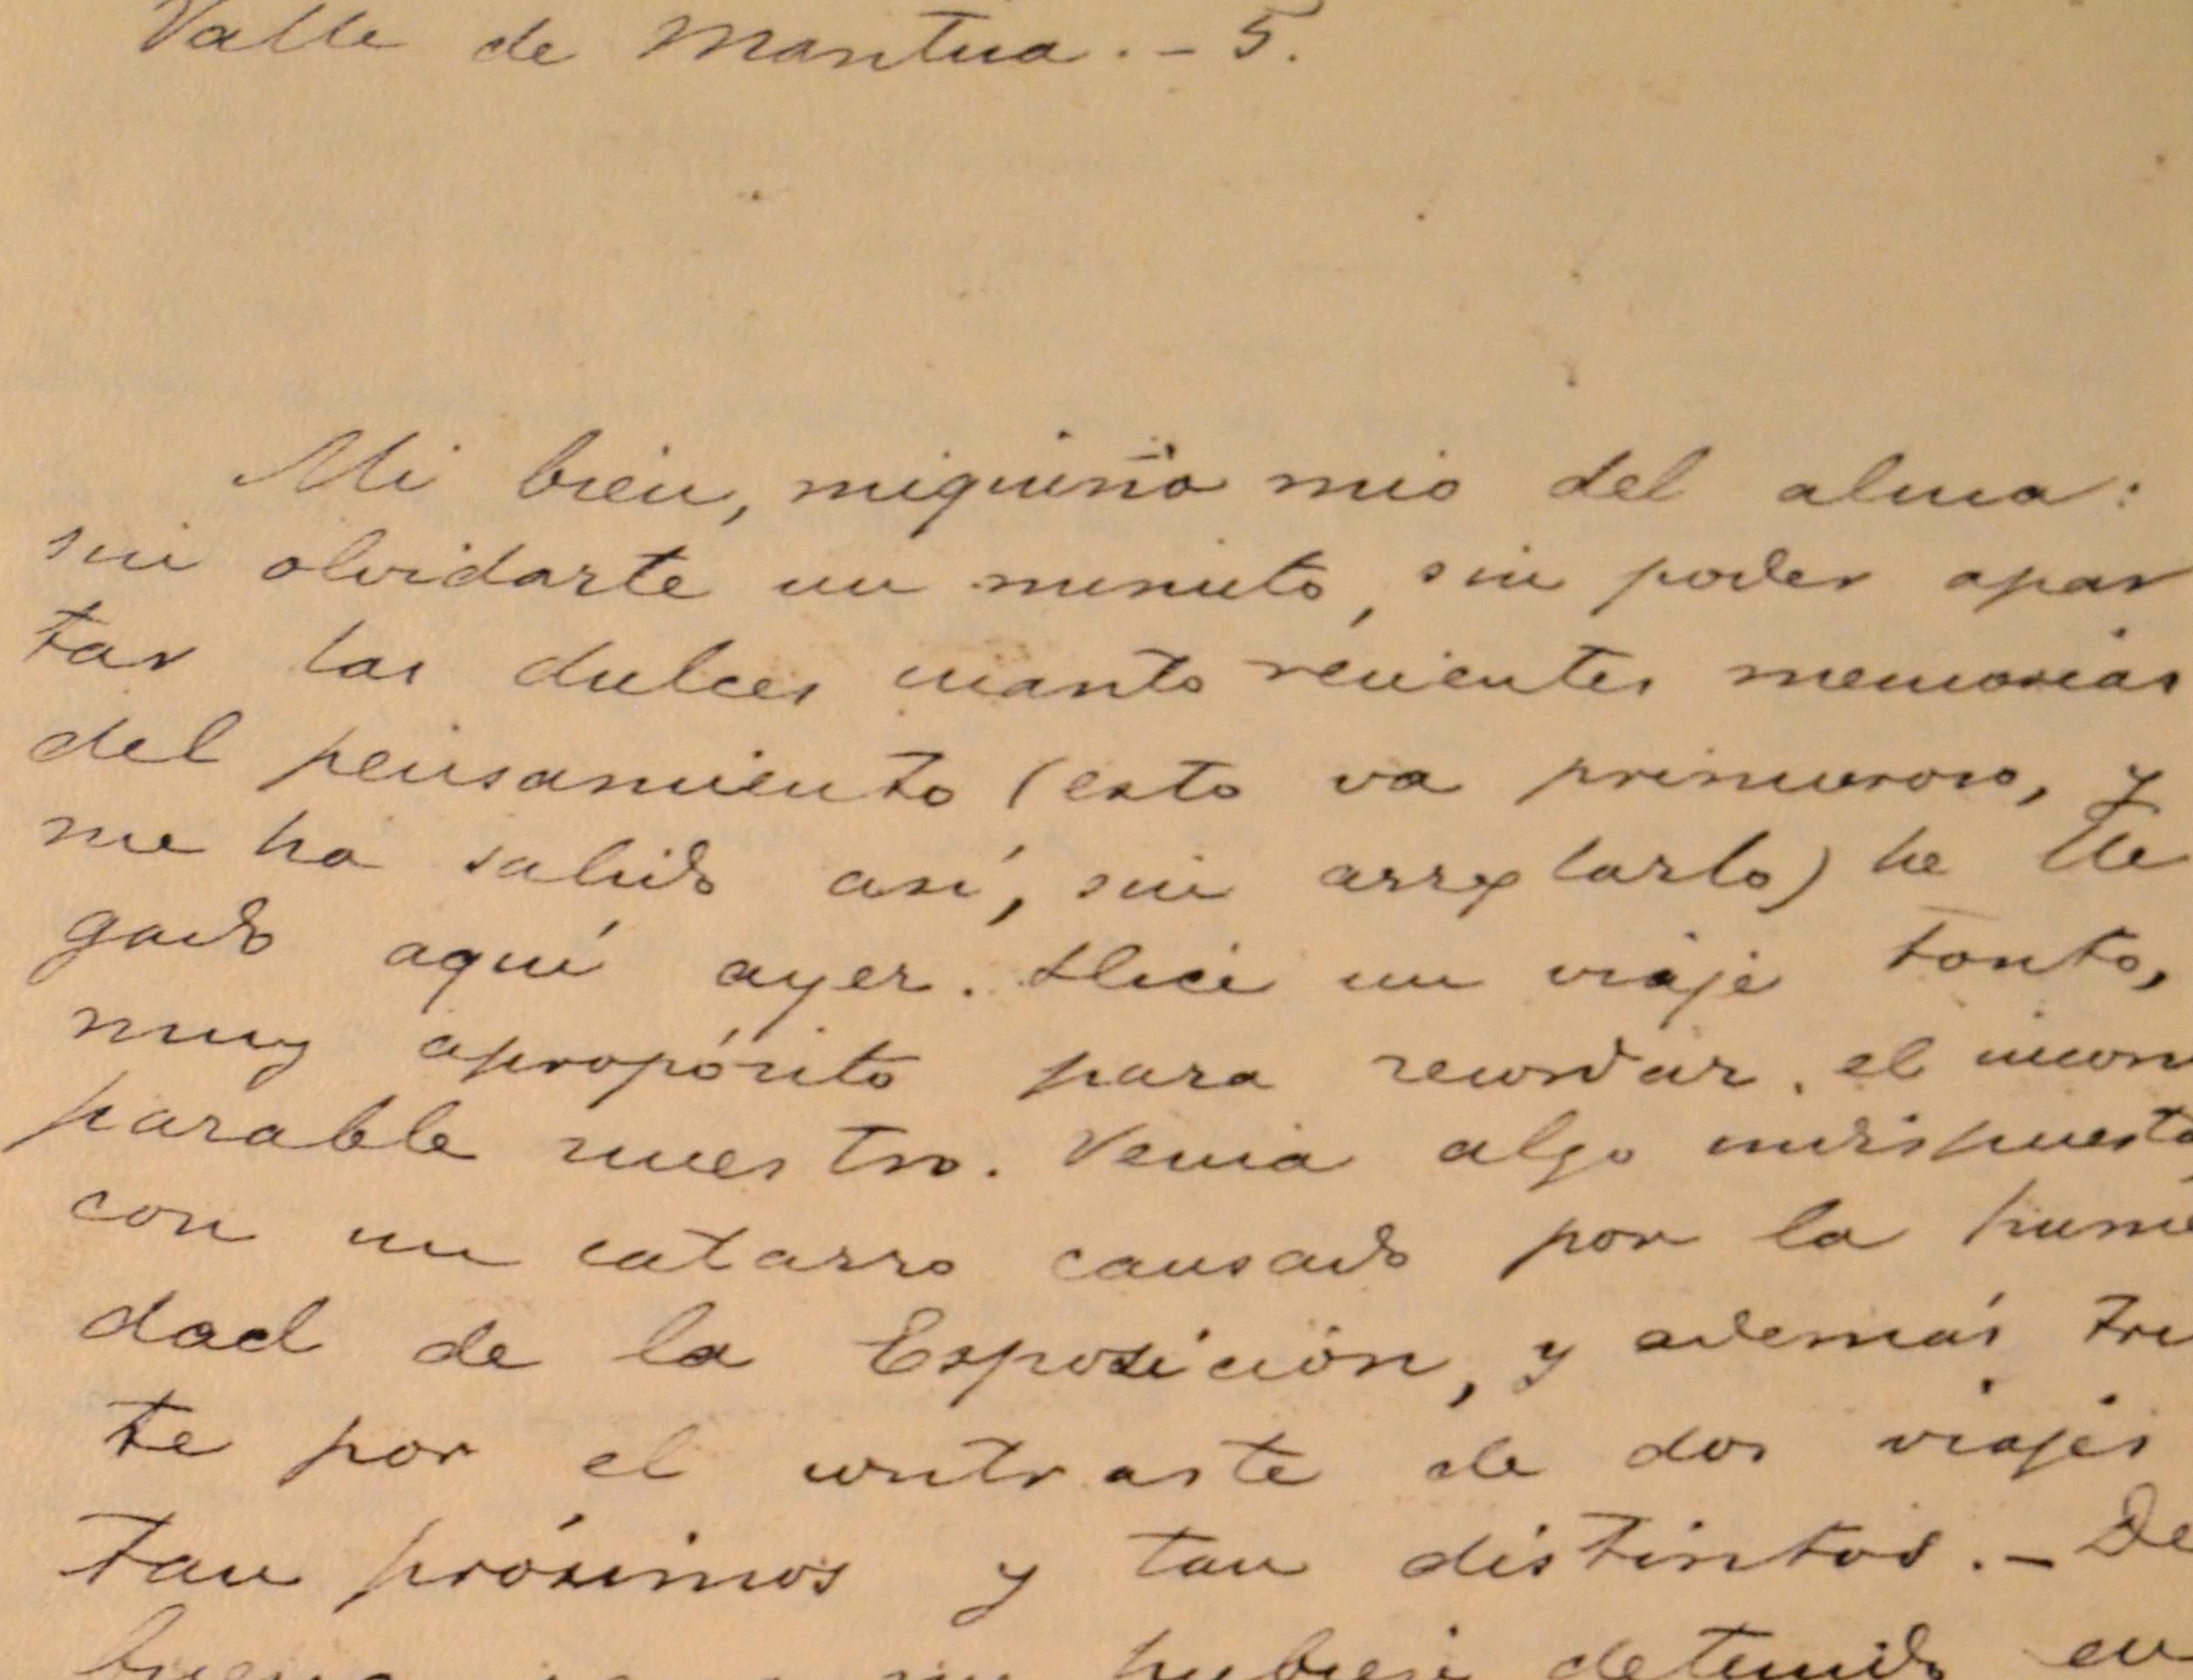 burdiel carta manuscrita de emilia archivo de la RAE